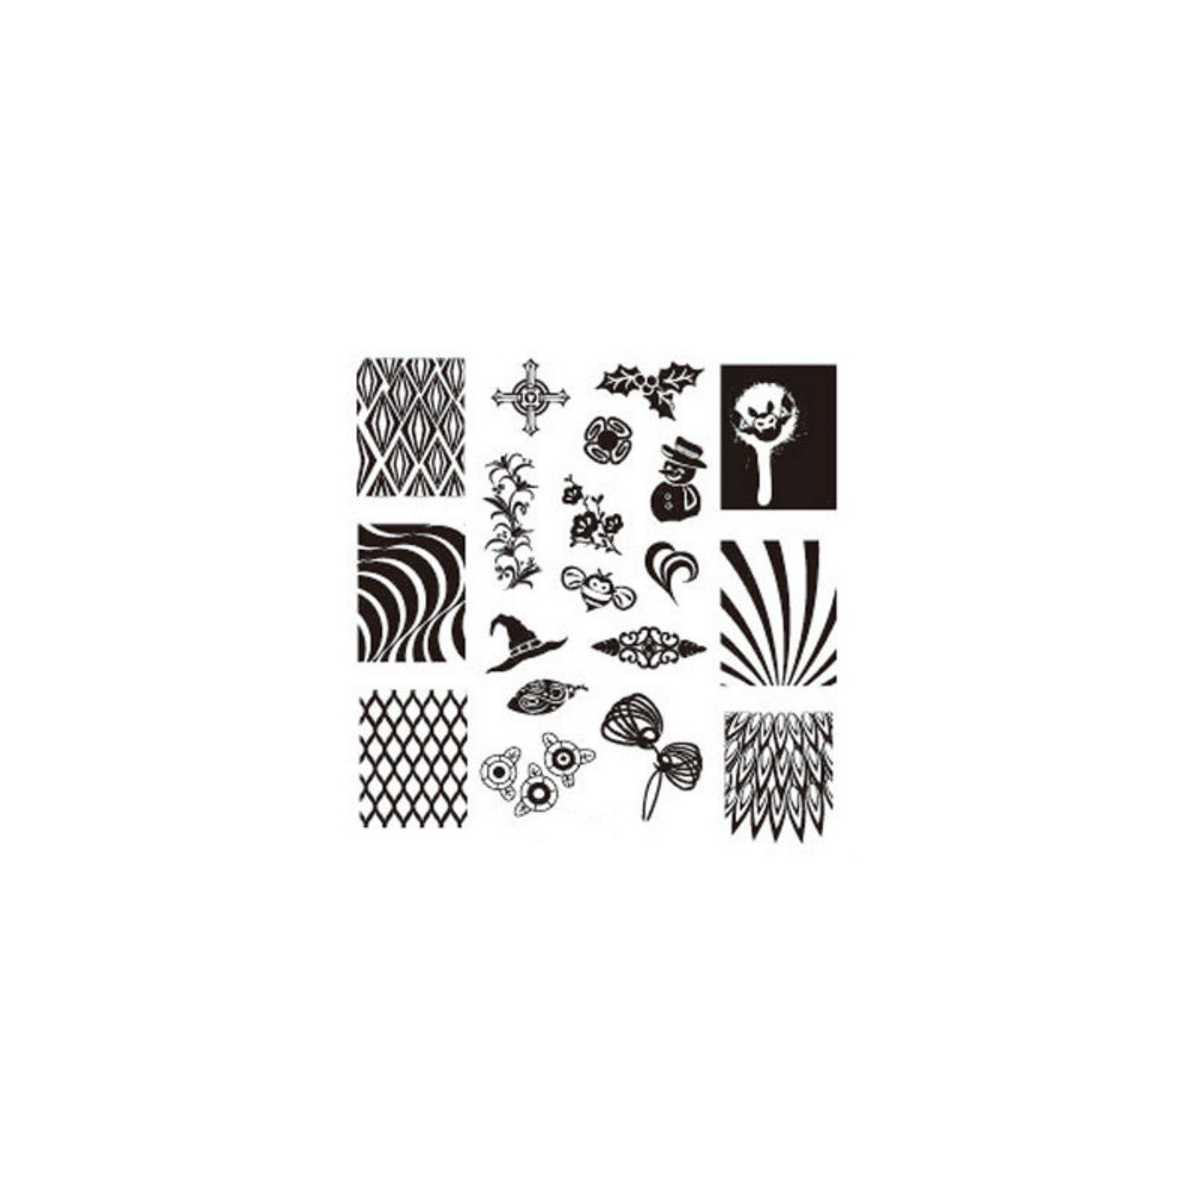 https://www.kit-manucure.com/1015-thickbox_default/plaque-de-stamping-nail-art-intégrale.jpg